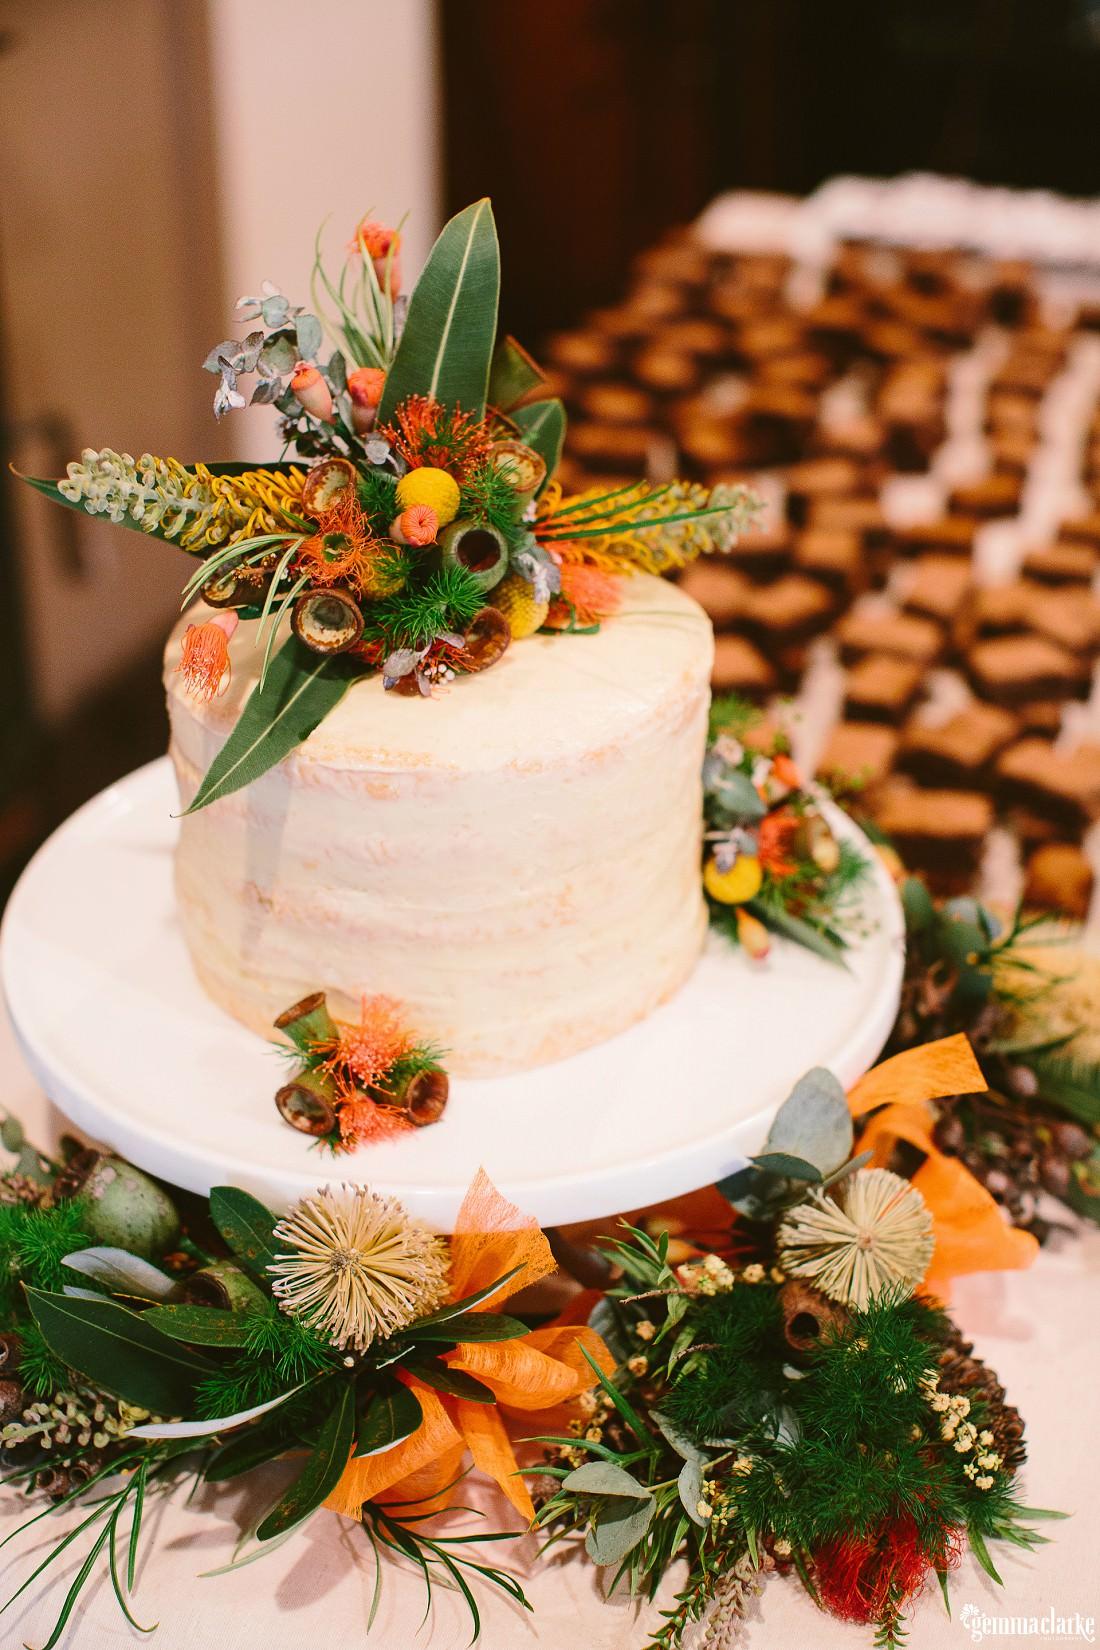 One tier naked wedding cake with native flowers - Kangaroo Valley Bush Retreat